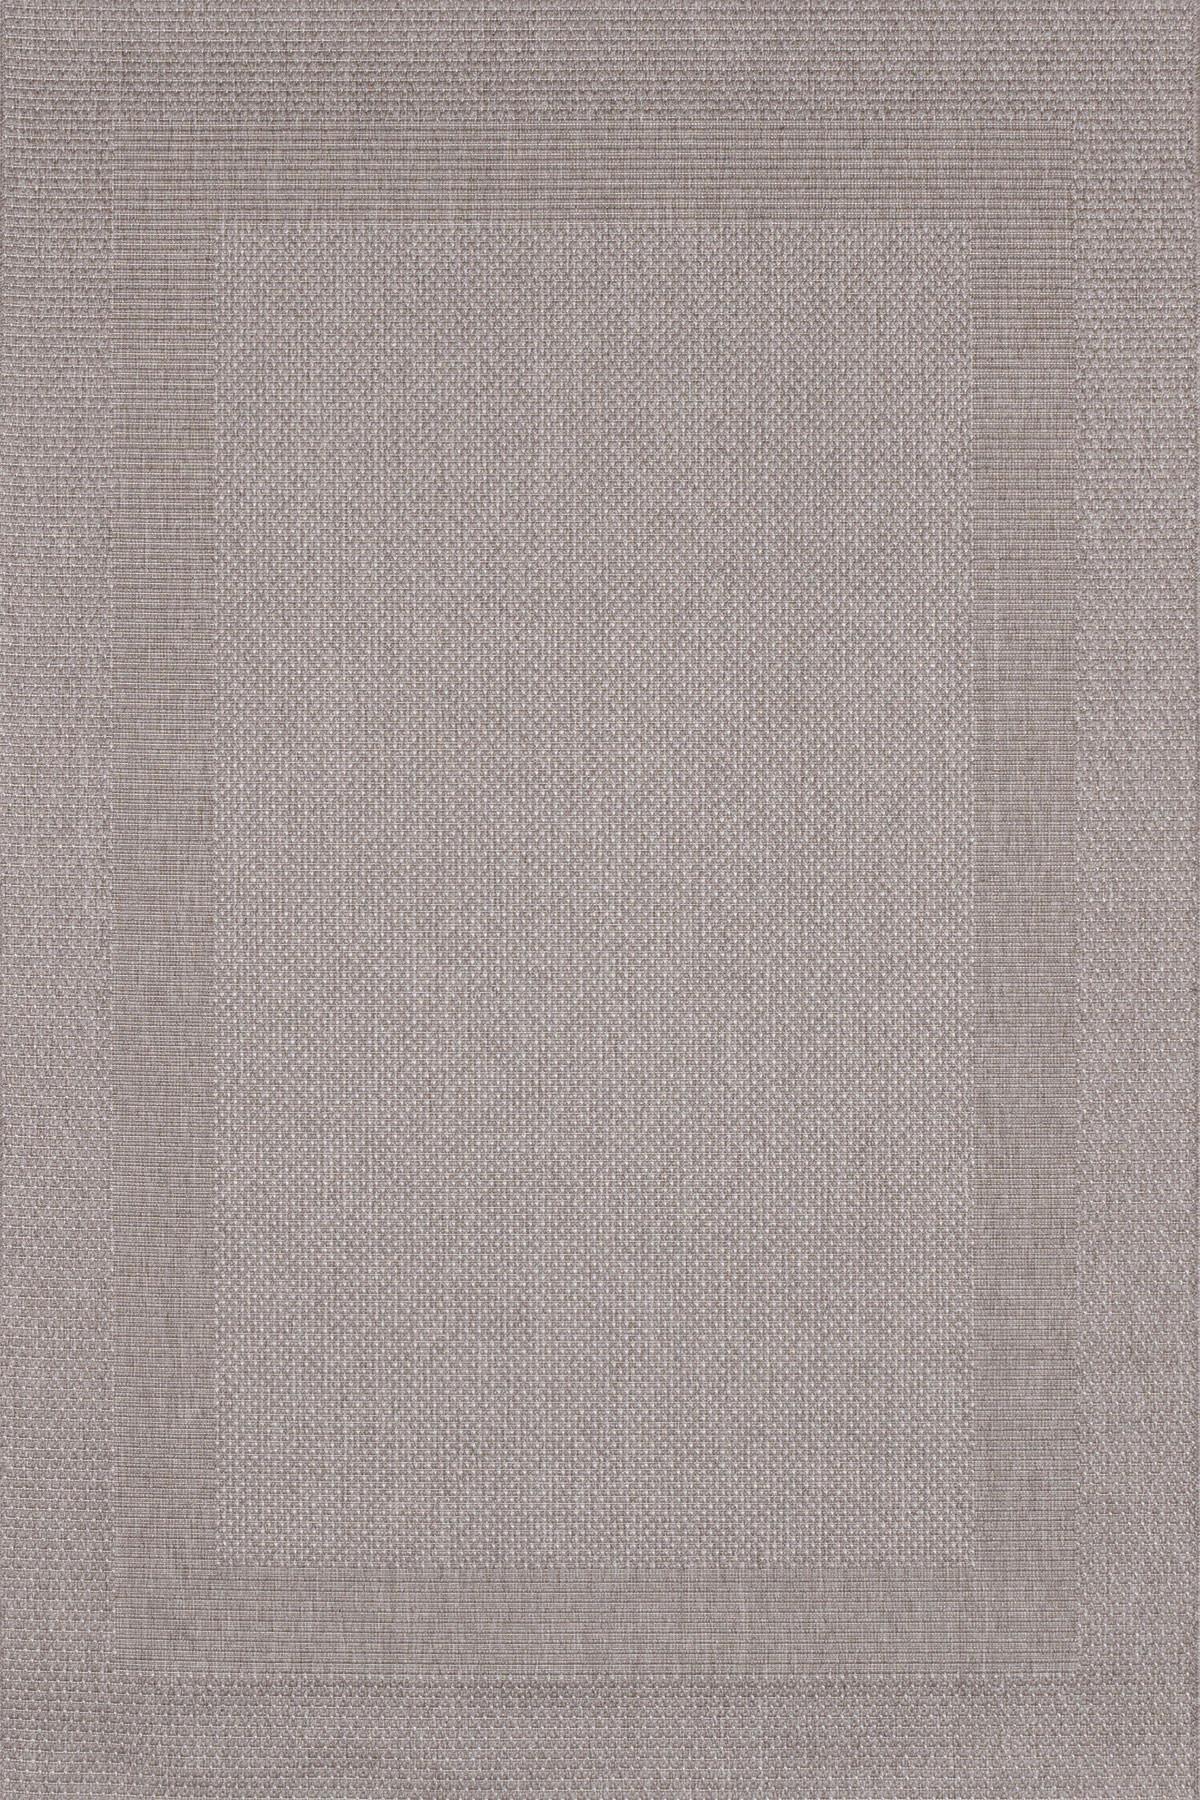 Sintelon koberce Kusový Koberec Adria 01/BEB - 160x230 cm